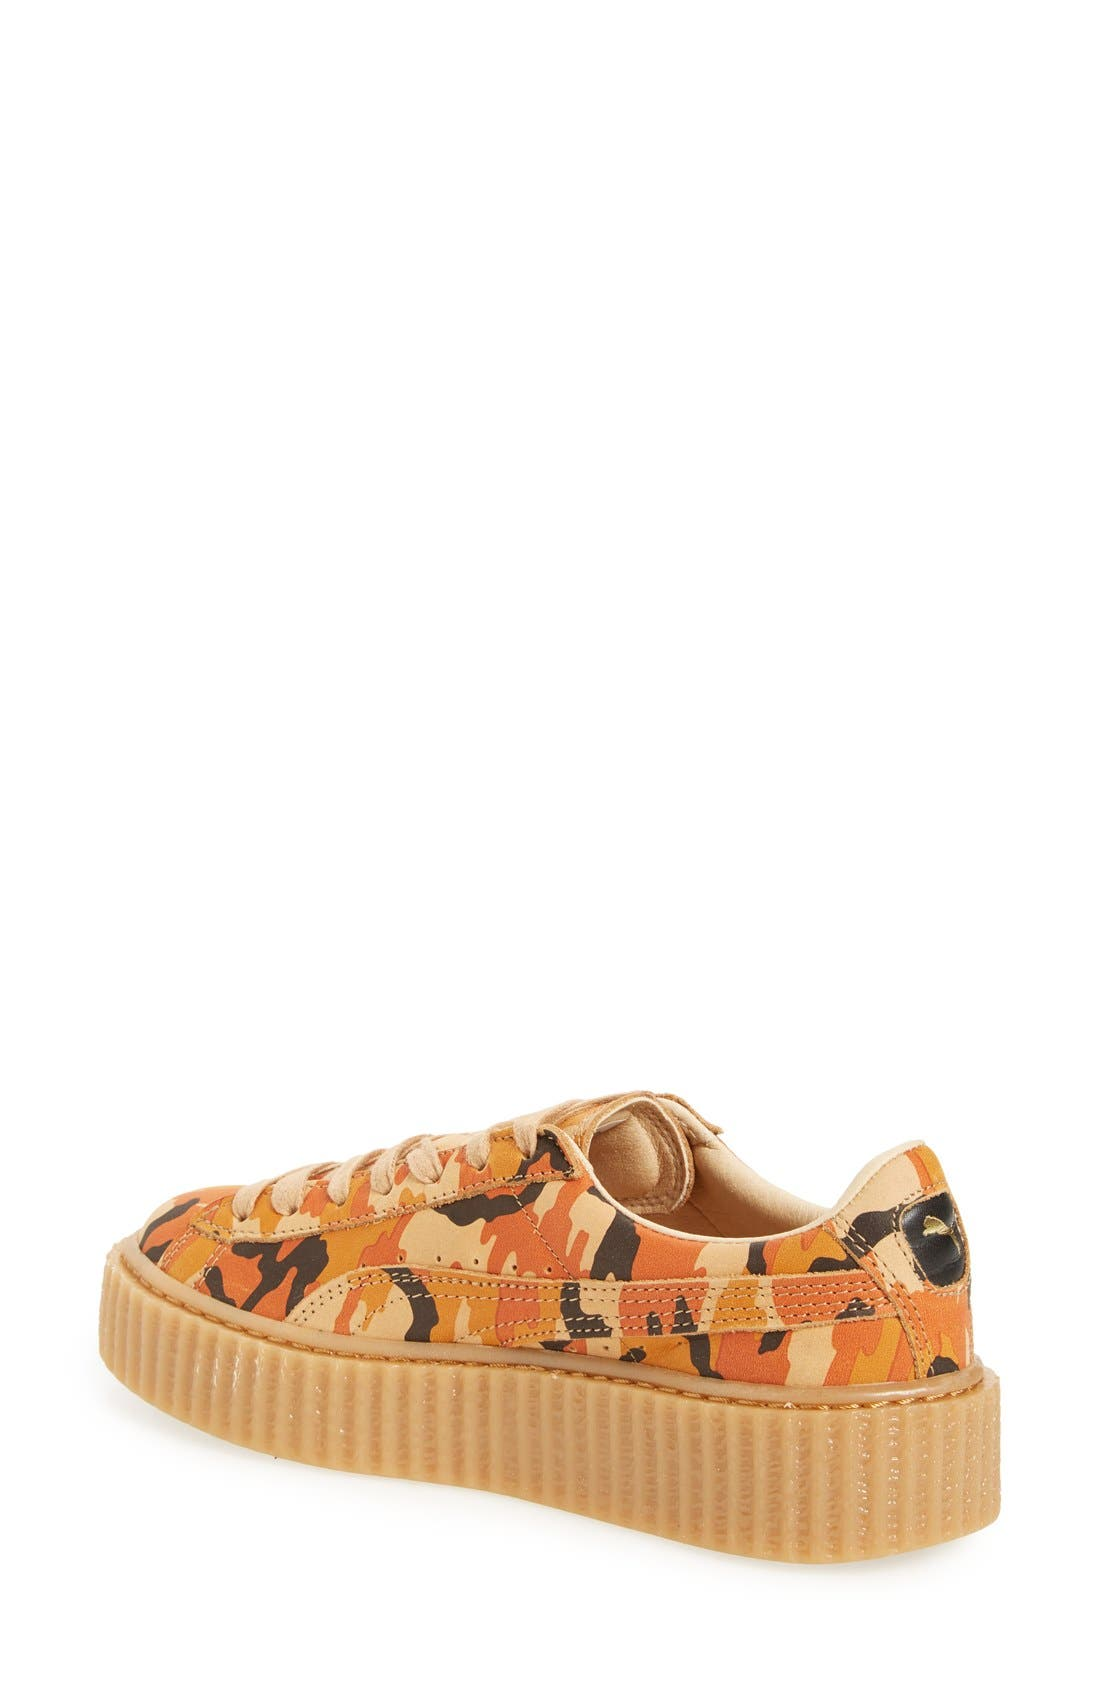 FENTY PUMA by Rihanna Creeper Sneaker,                             Alternate thumbnail 60, color,